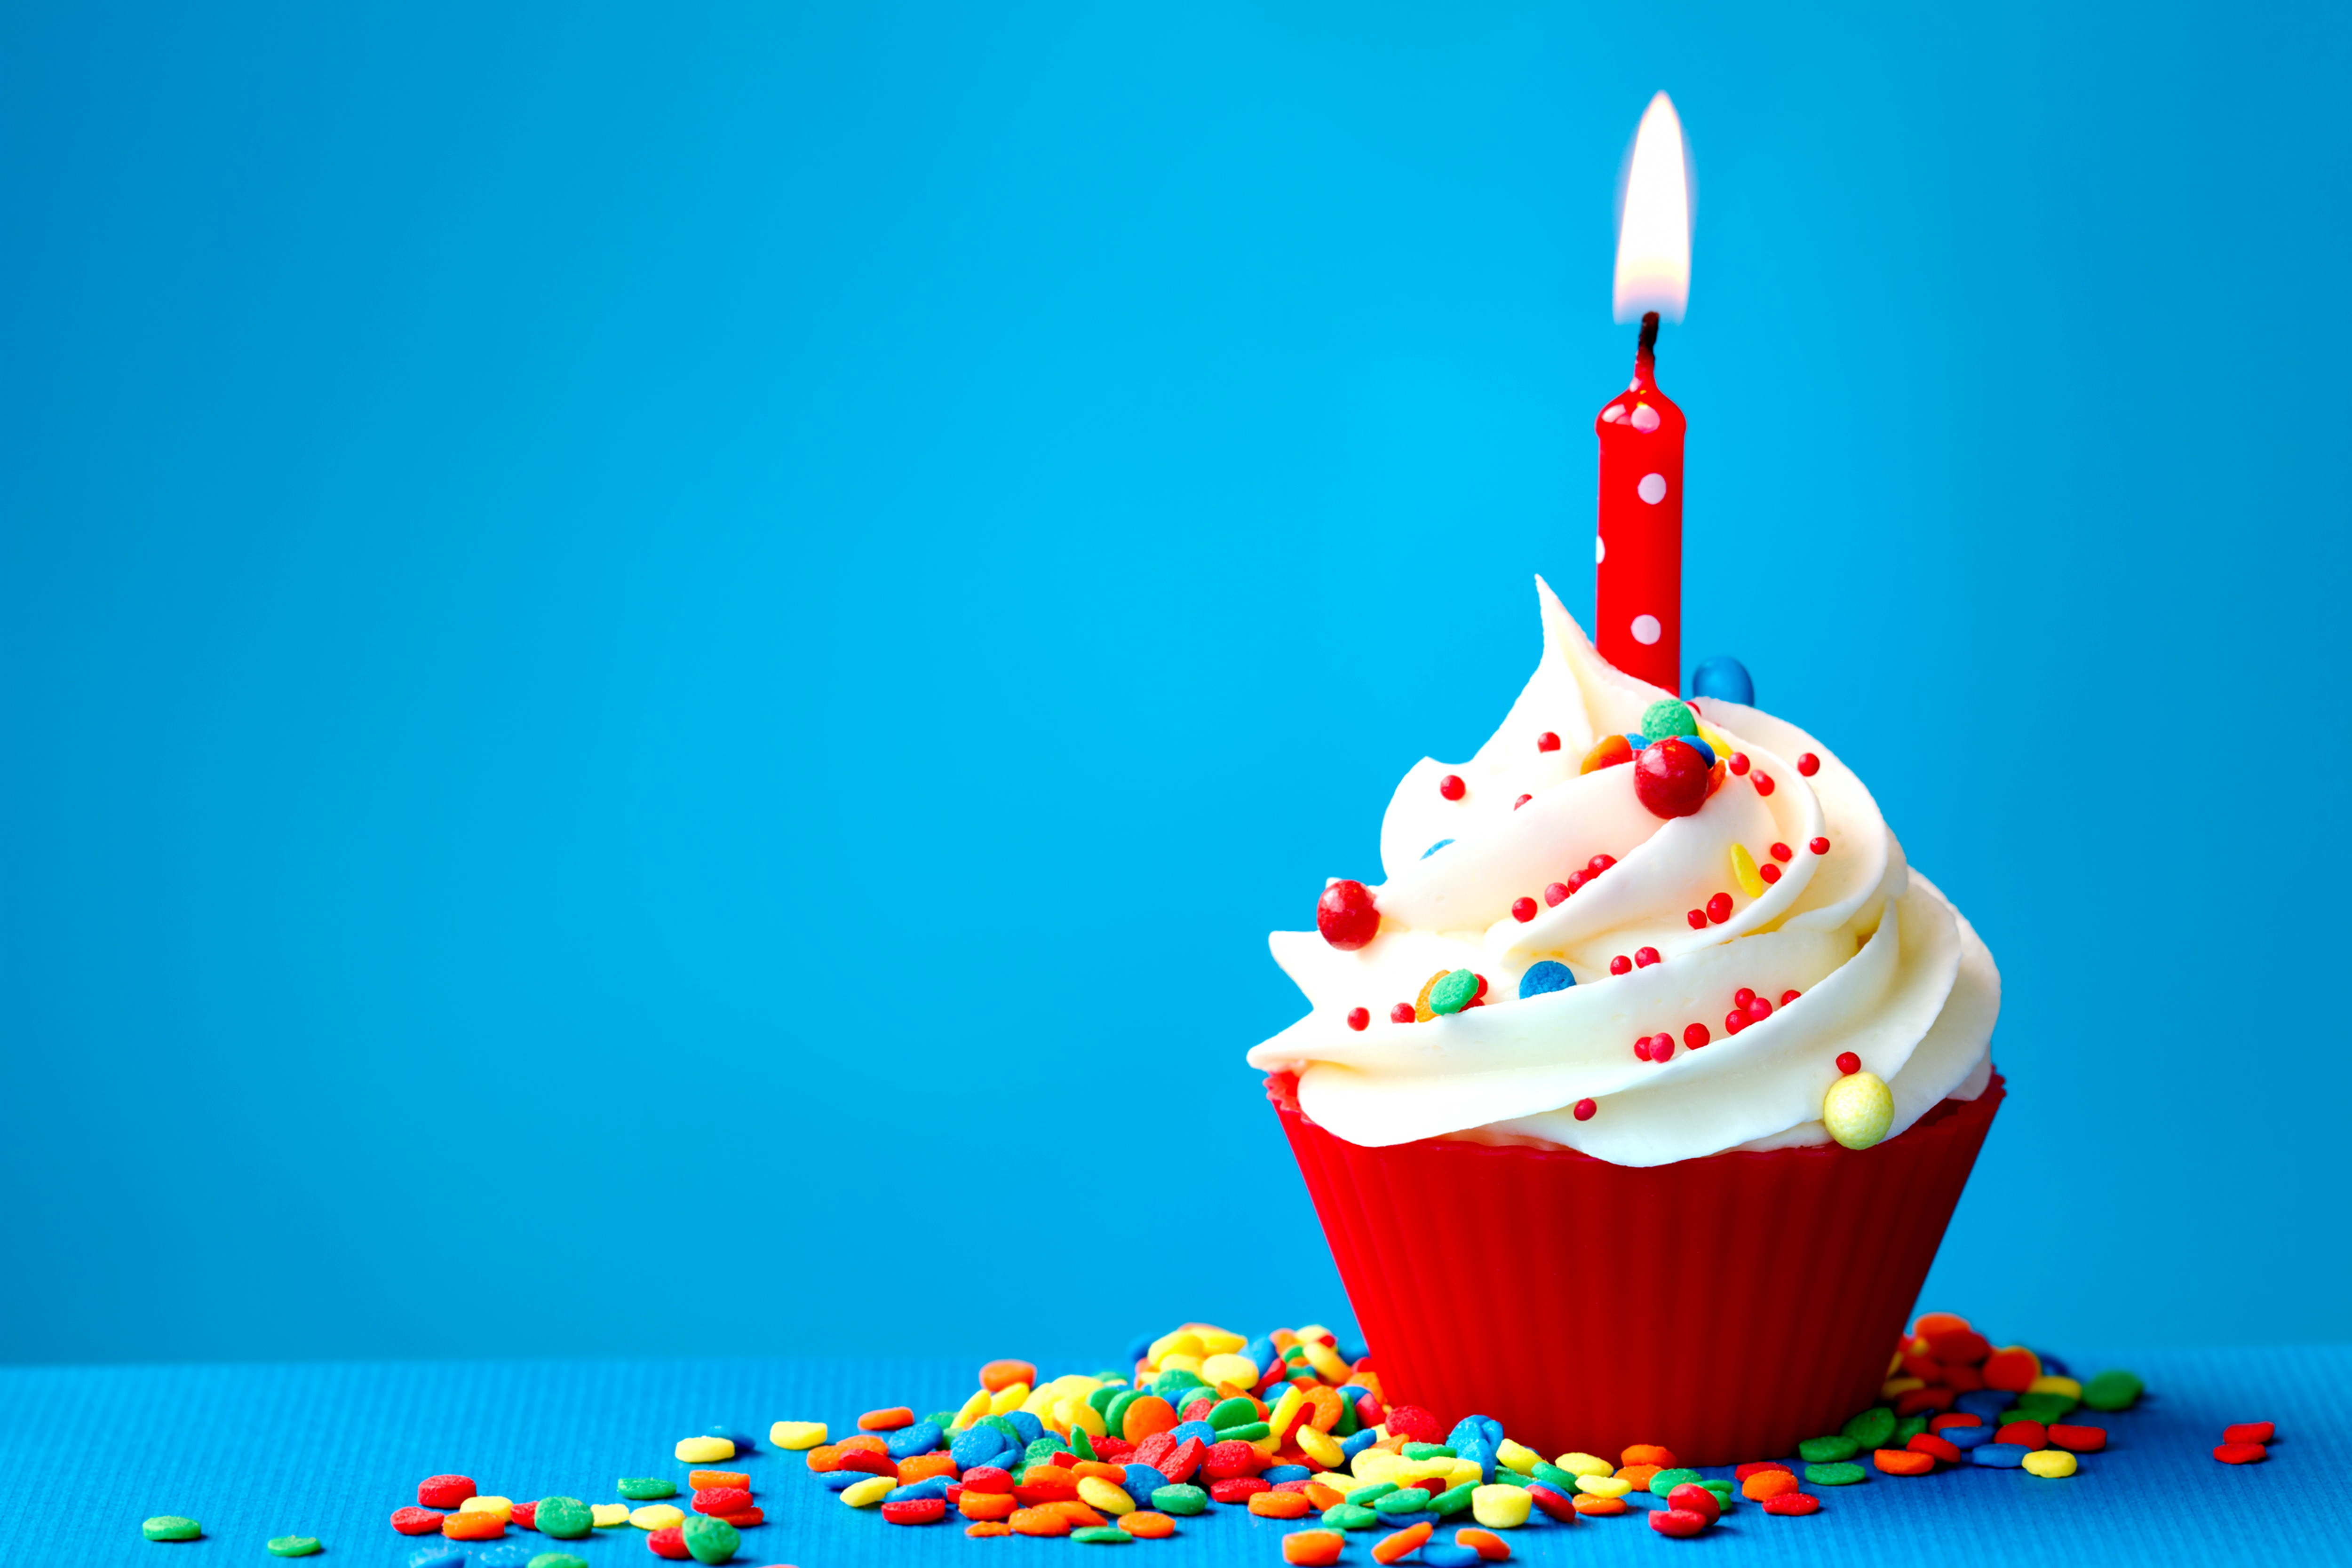 Awe Inspiring Free Download Birthday Cake Desktop Background 5000X3334 For Funny Birthday Cards Online Elaedamsfinfo